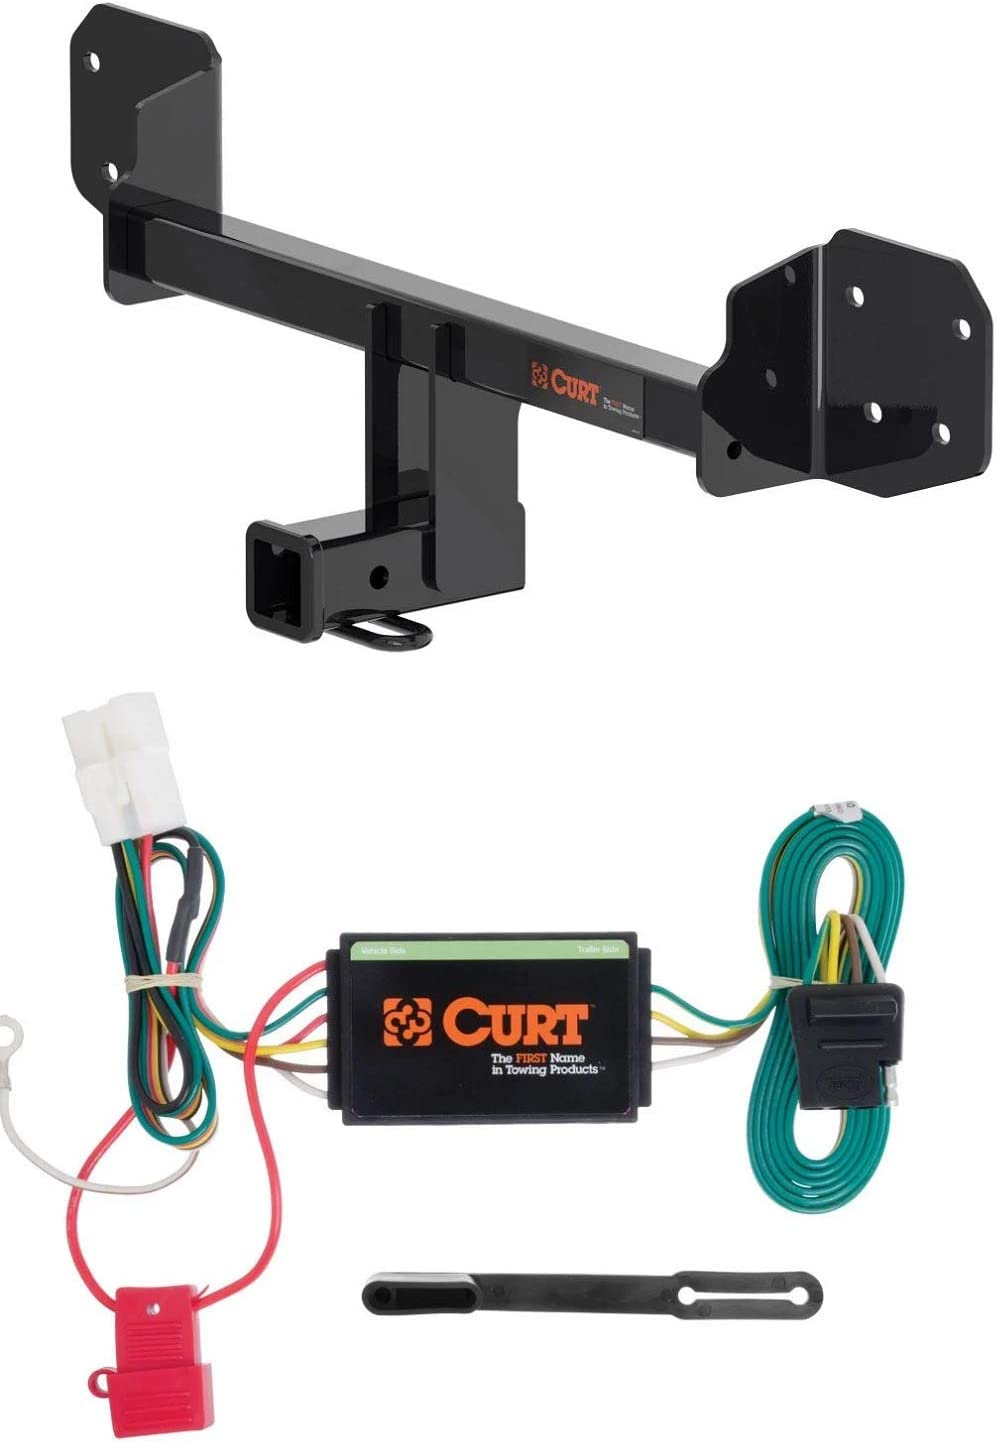 Curt 13410 56040 Class 3 Trailer Hitch 2-Inch Receiver with 4-Way Flat Custom Wiring Harness Bundle